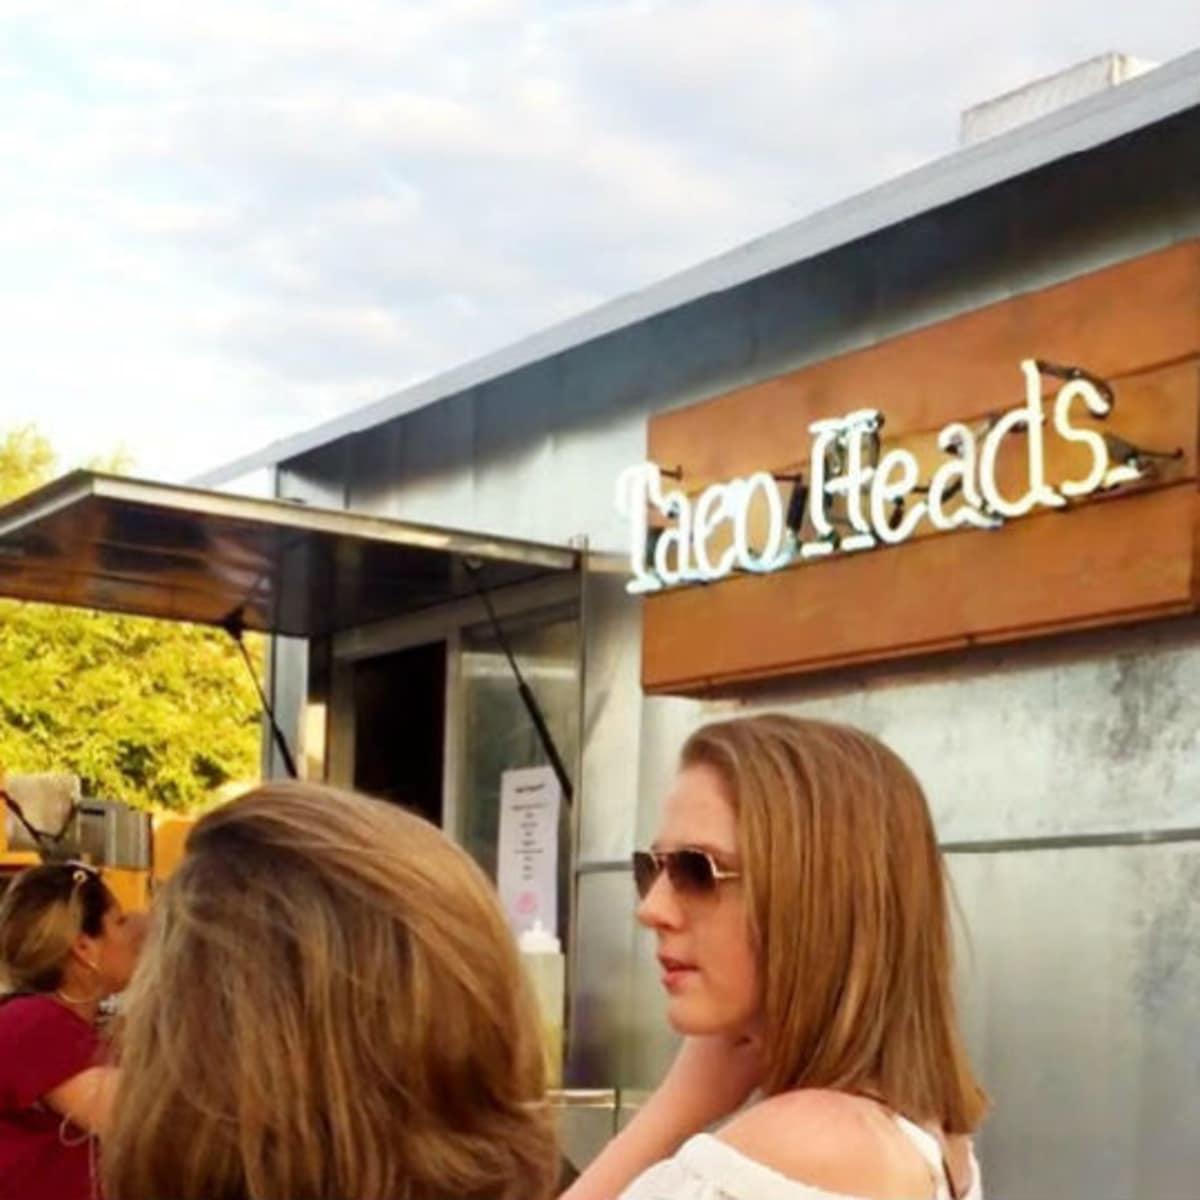 Tacoheads taco trailer